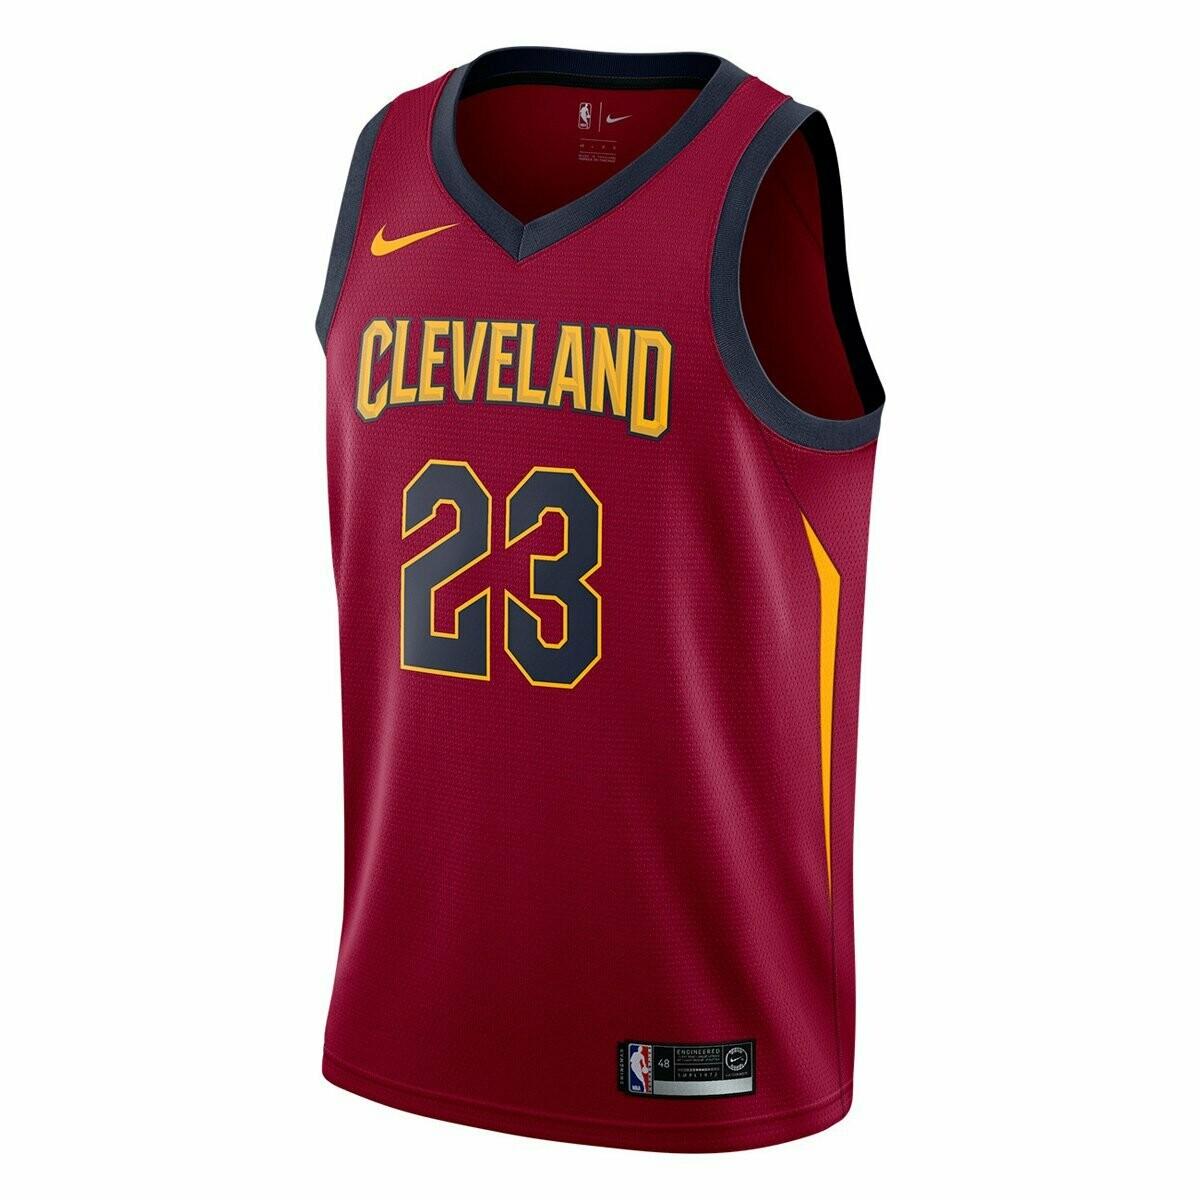 Camiseta Regata Nike Cleveland Cavaliers Swingman NBA - Lebron James - Vermelho e Marinho